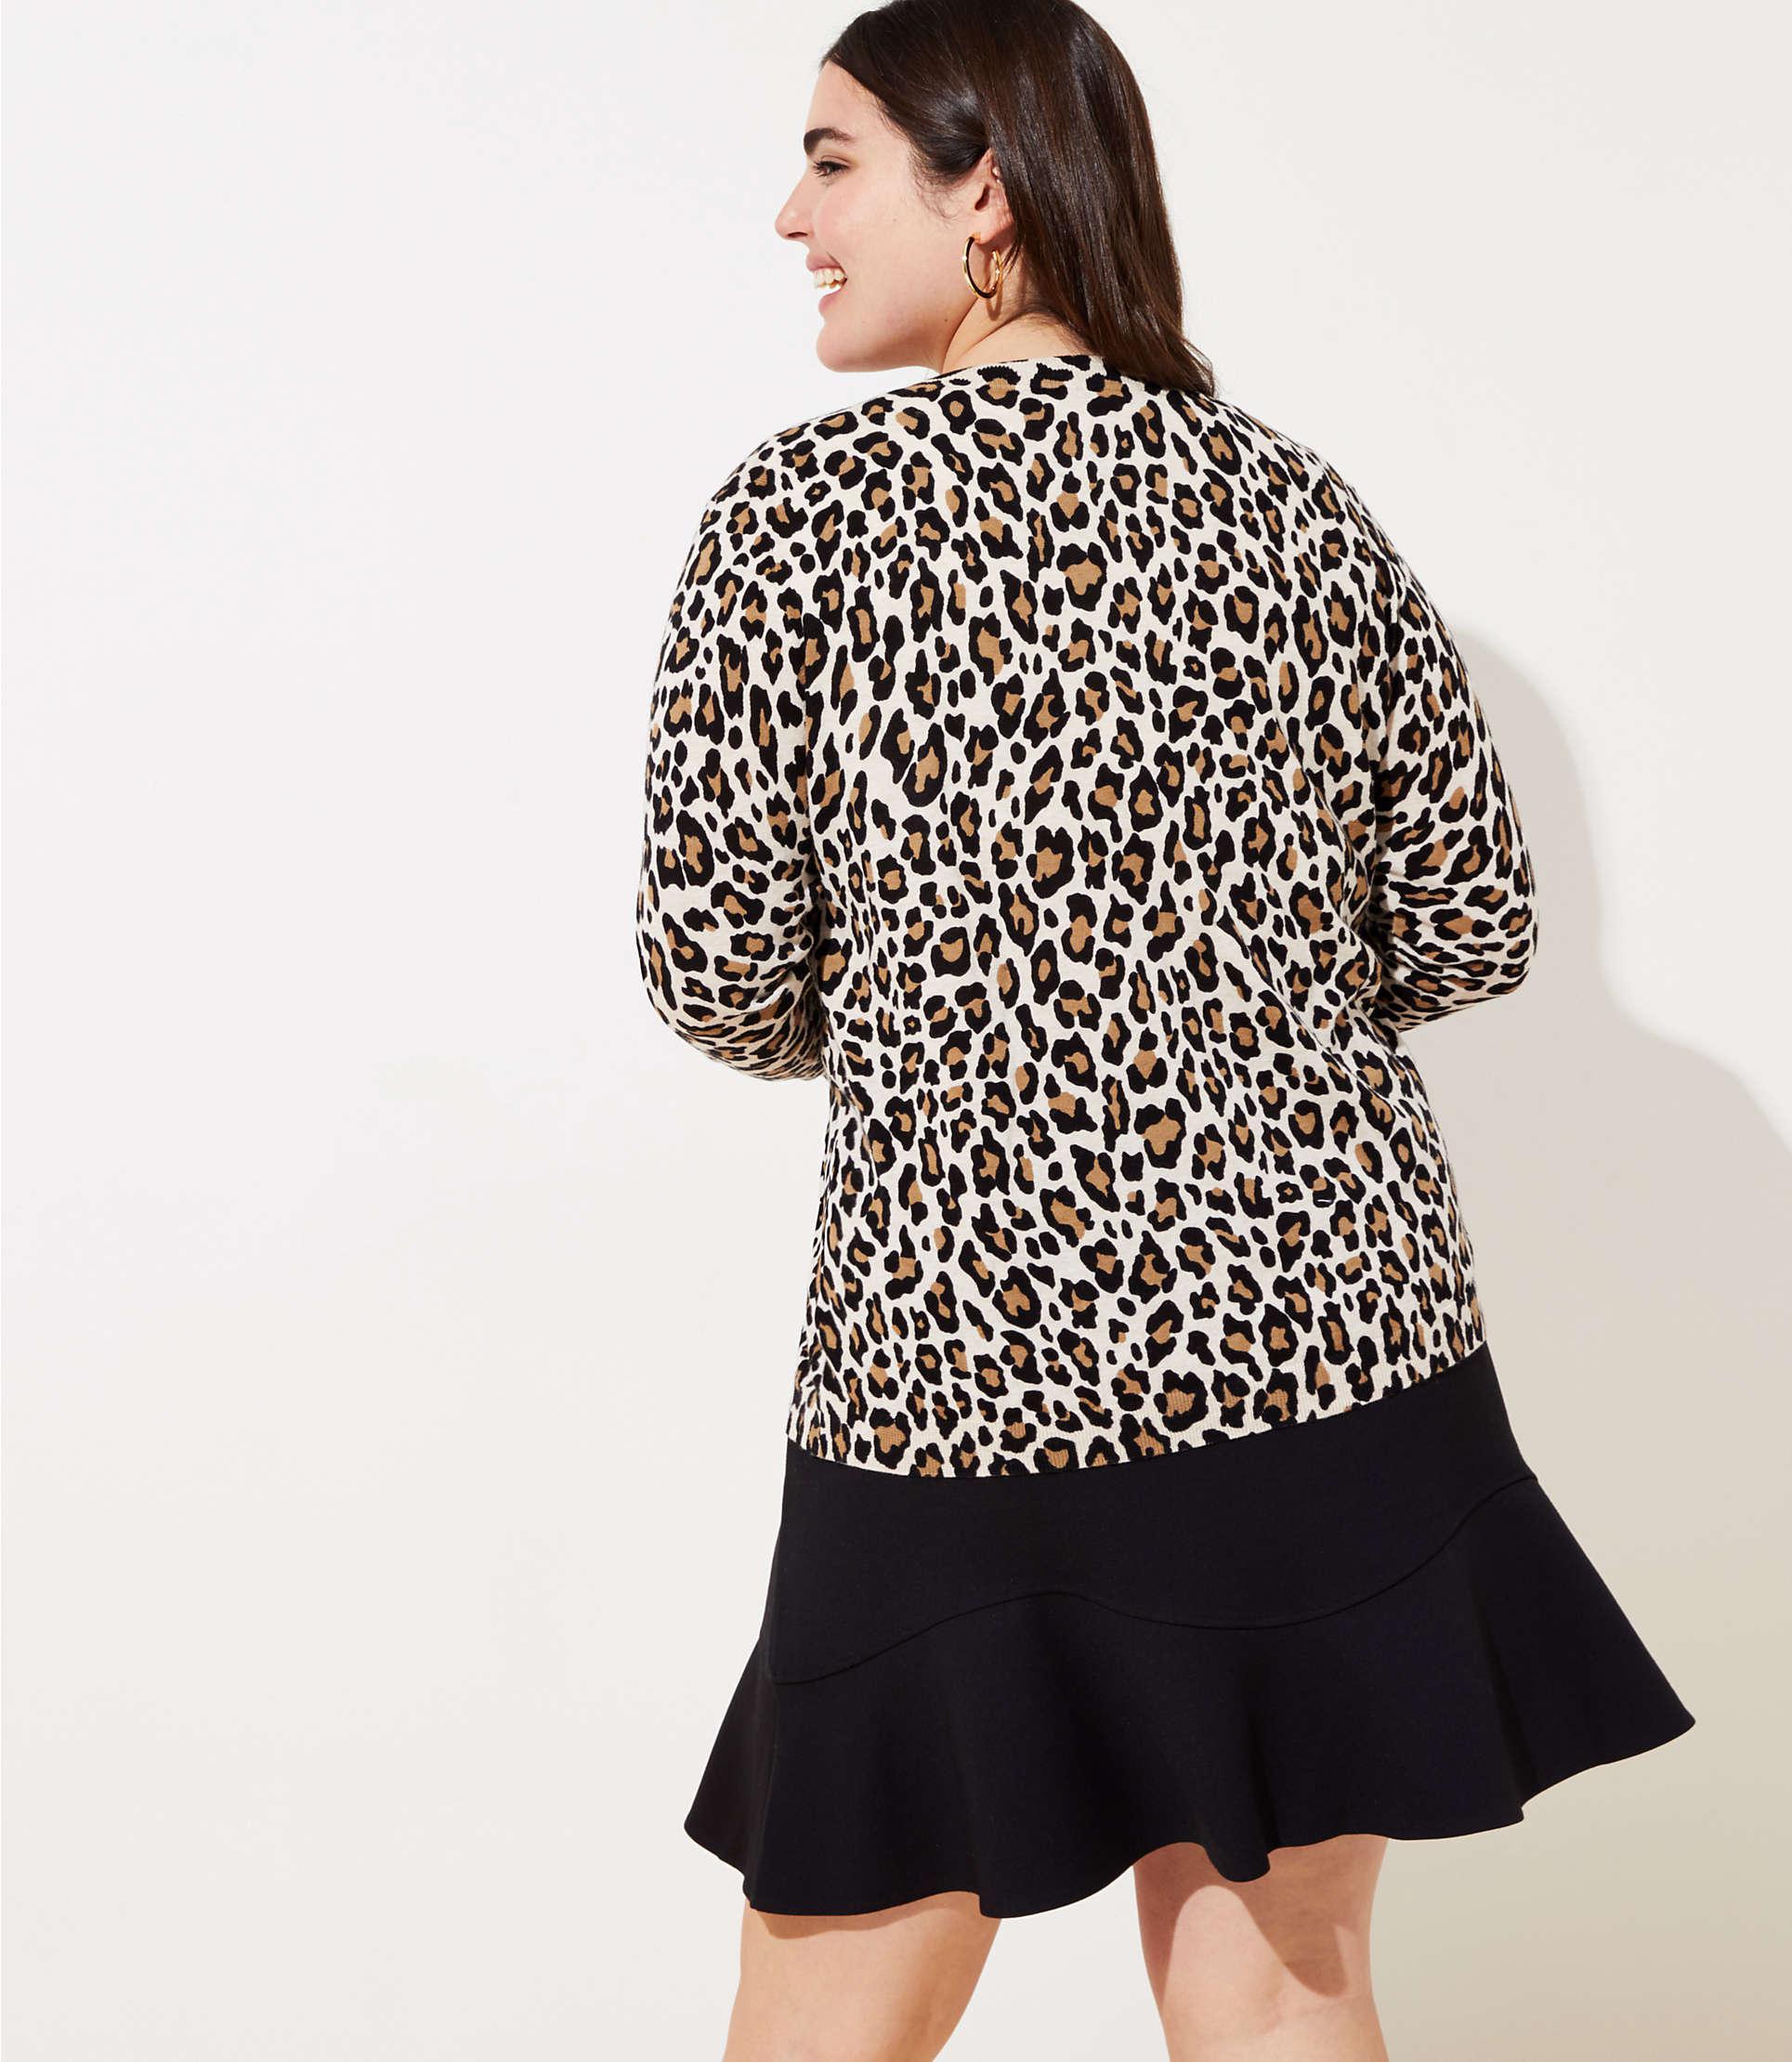 ff9c193dada LOFT - Black Plus Leopard Print Signature Cardigan - Lyst. View fullscreen